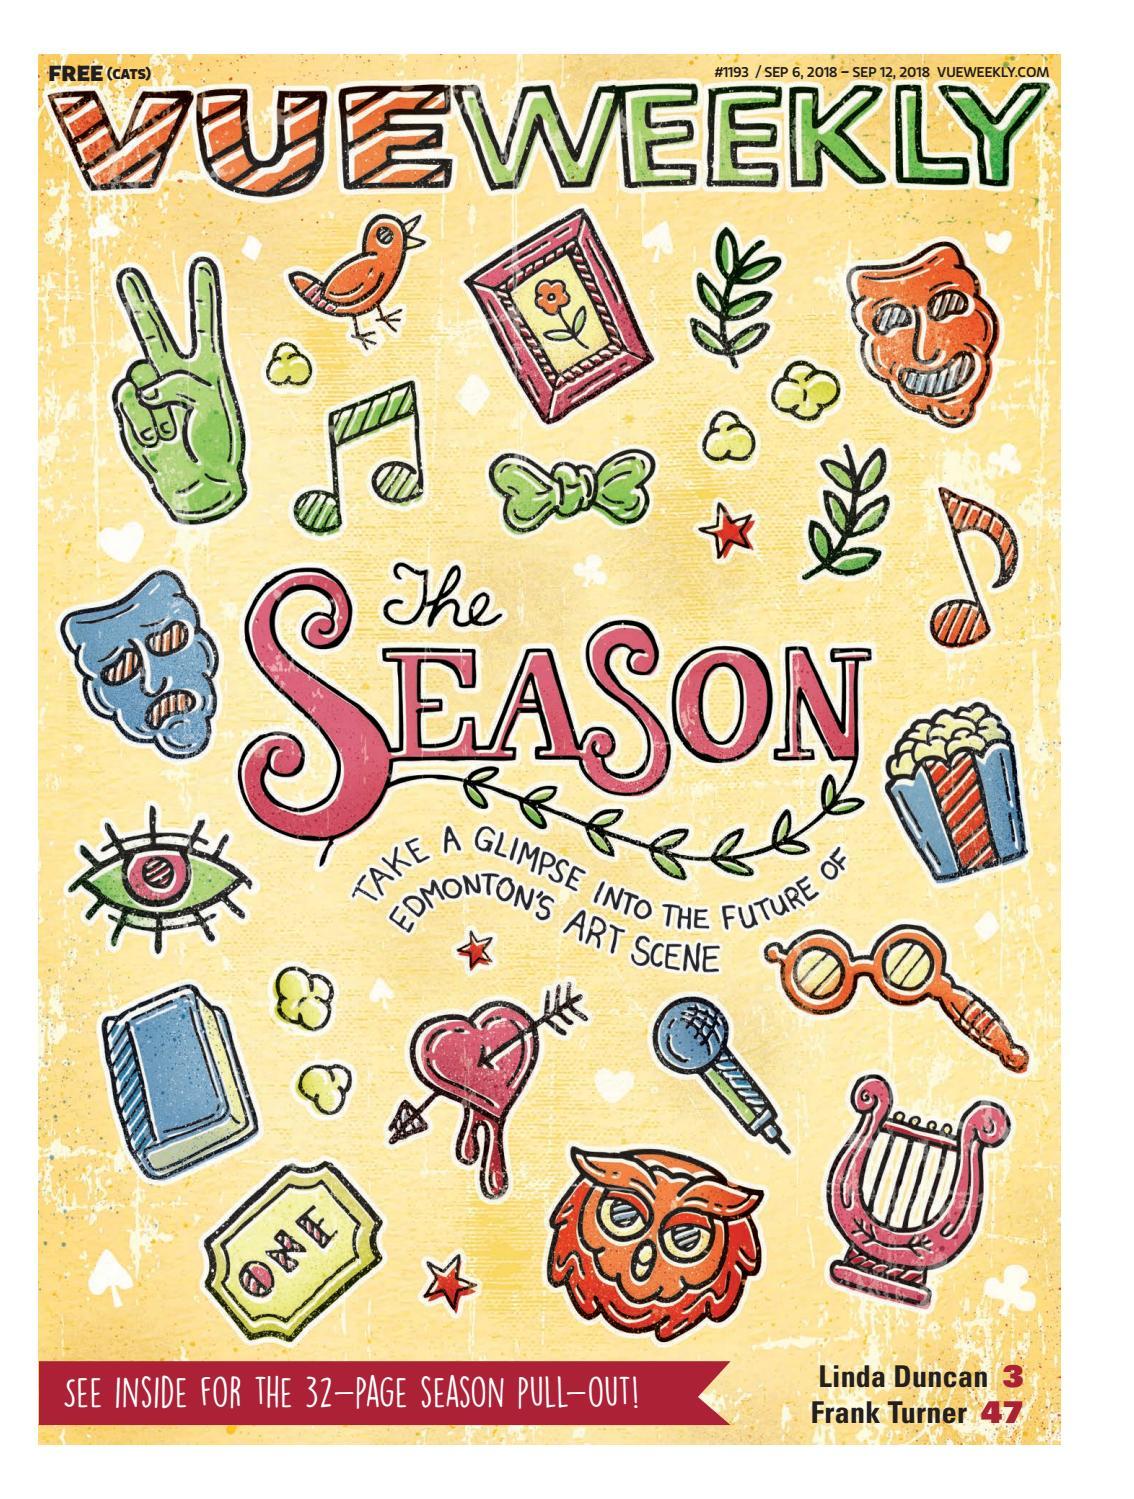 4365b014 1193: The Season by Vue Weekly - issuu